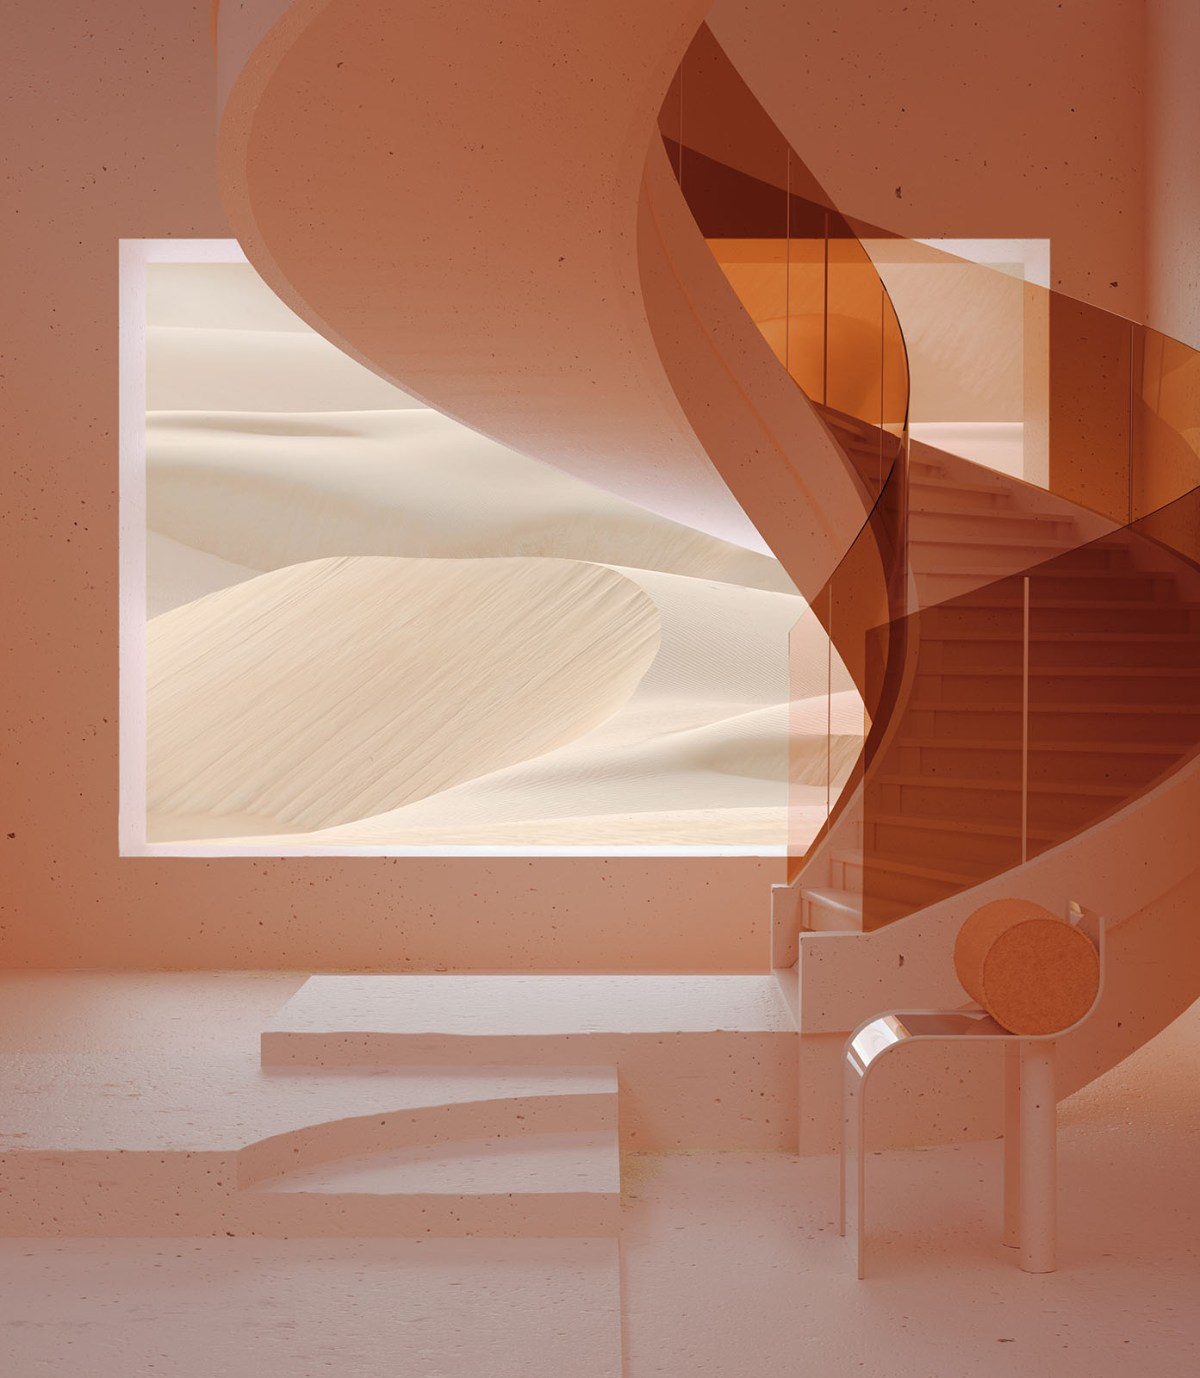 Digital-surrealists-Studio-Brasch-Sleep-Cycle-1